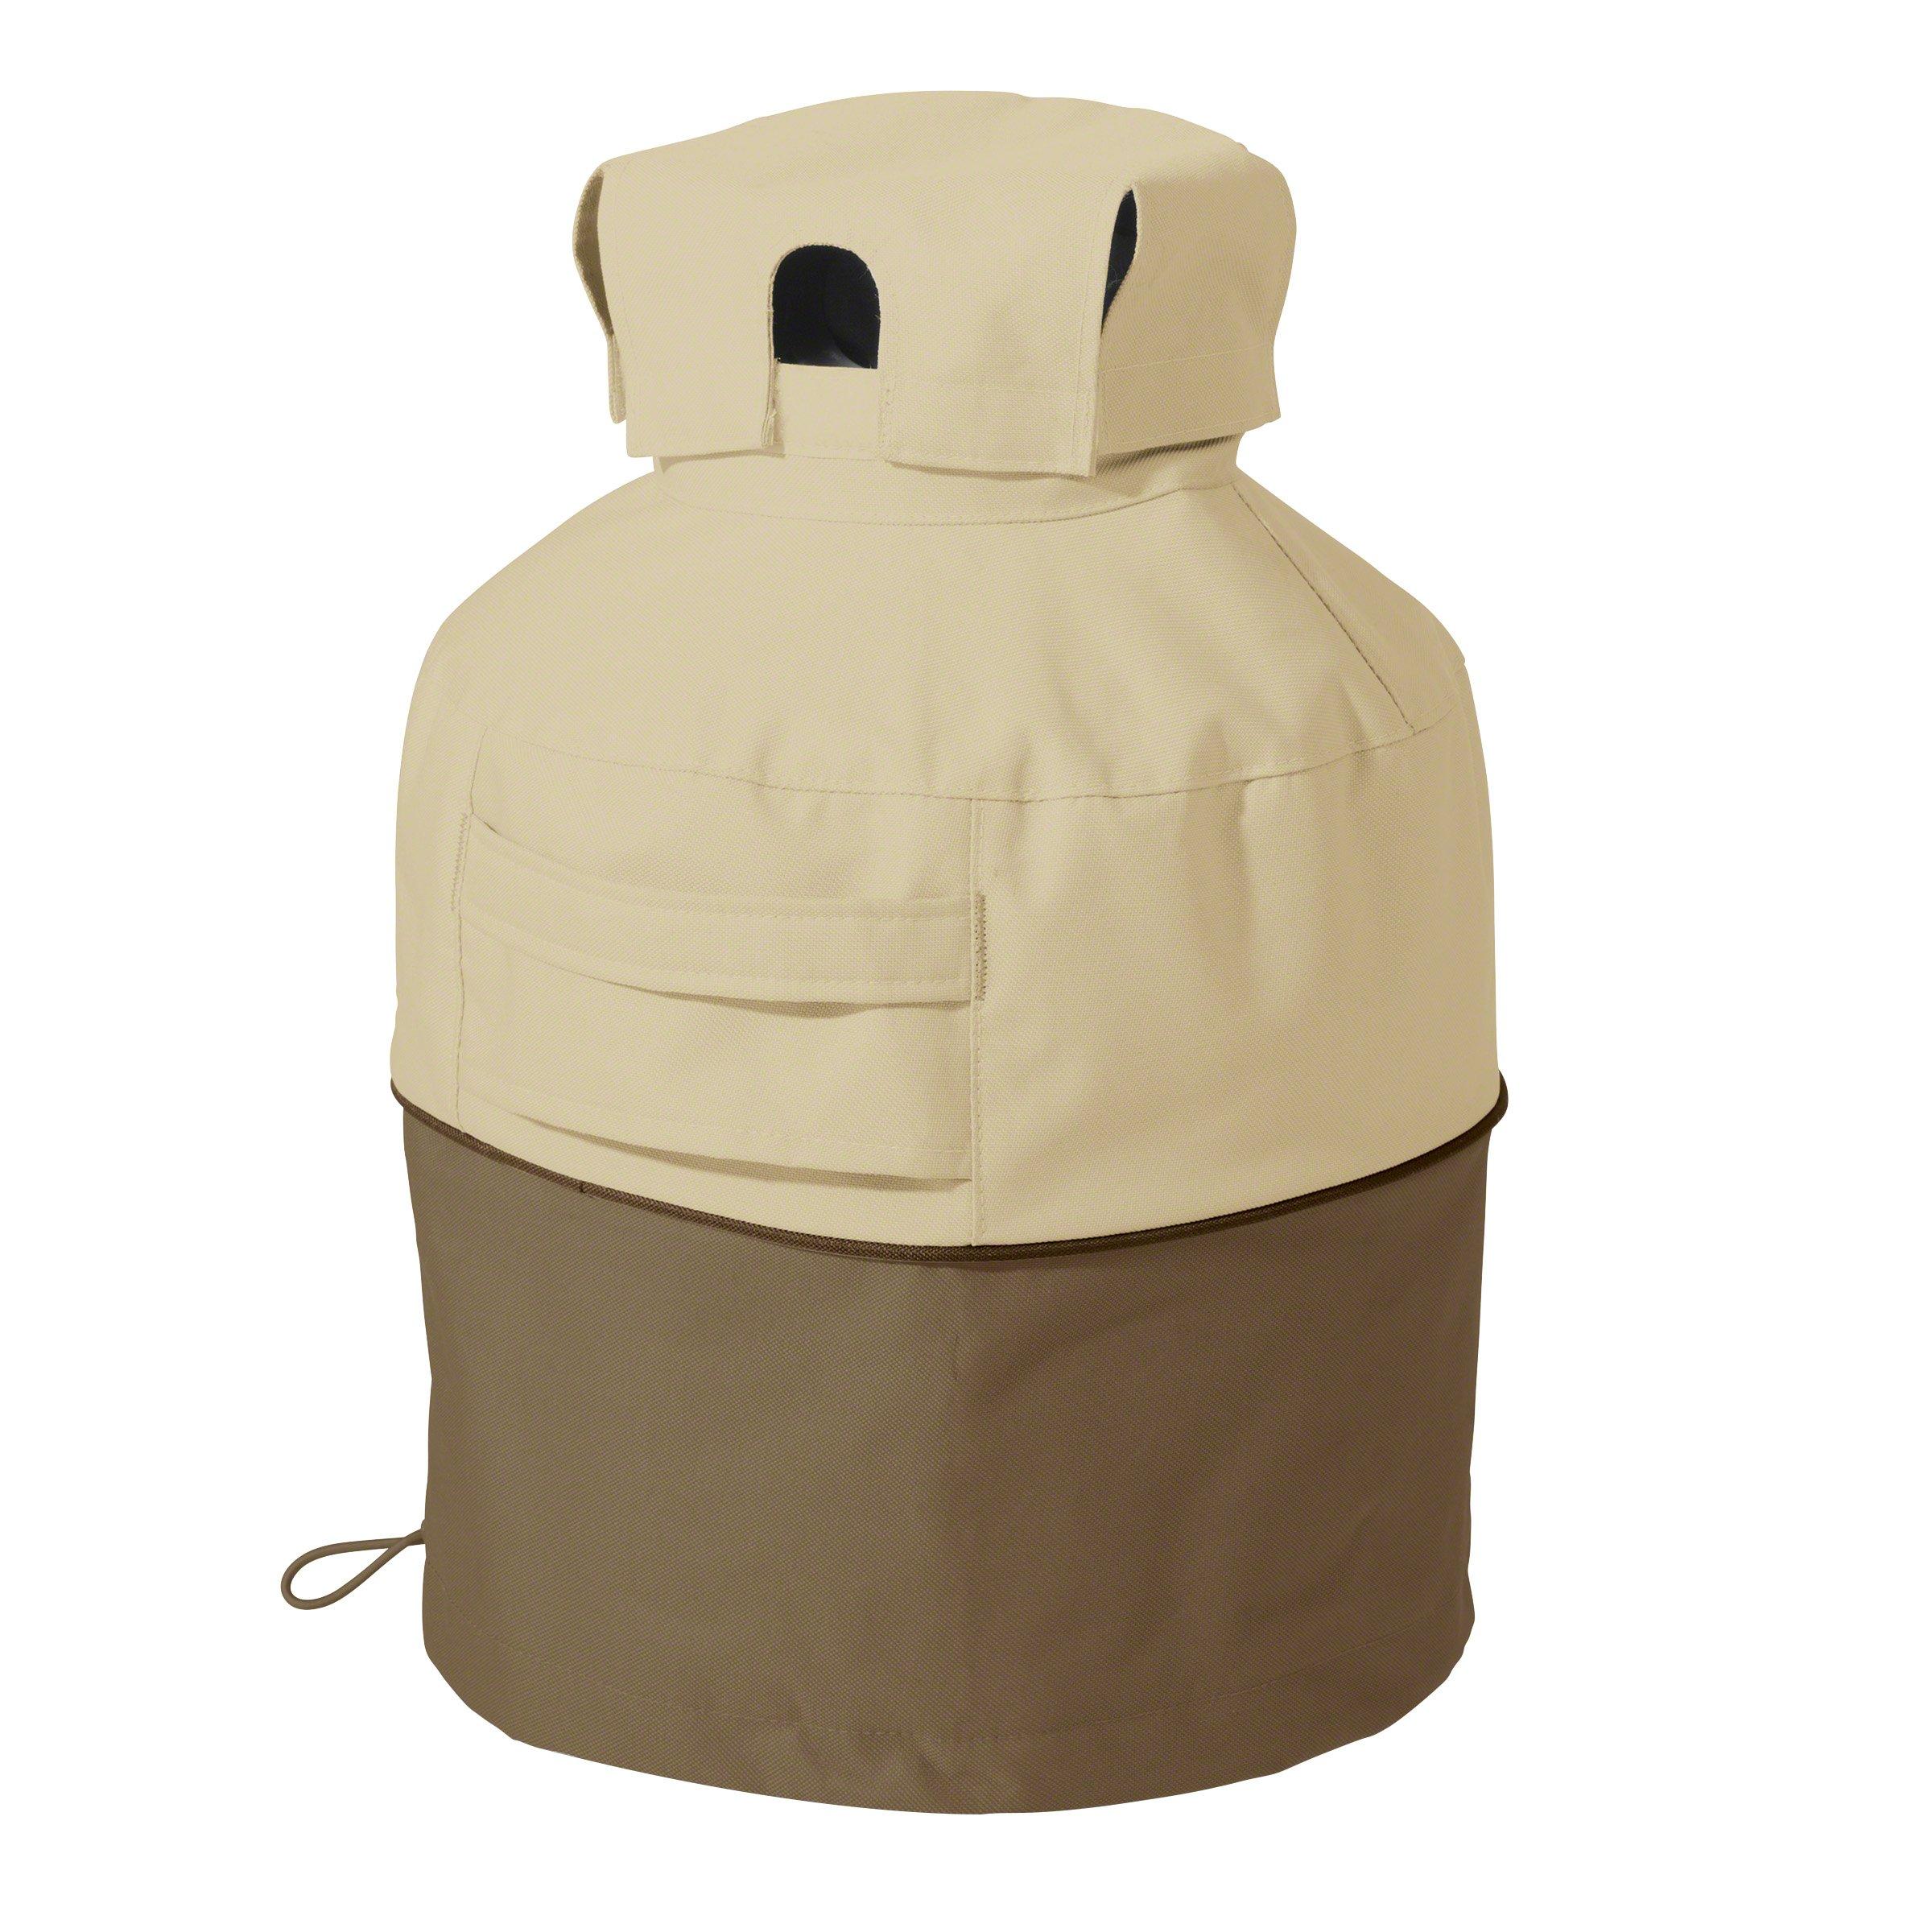 Classic Accessories Veranda 20lb Propane Tank Cover - Durable and Water-Resistant Cover (55-707-011501-00)